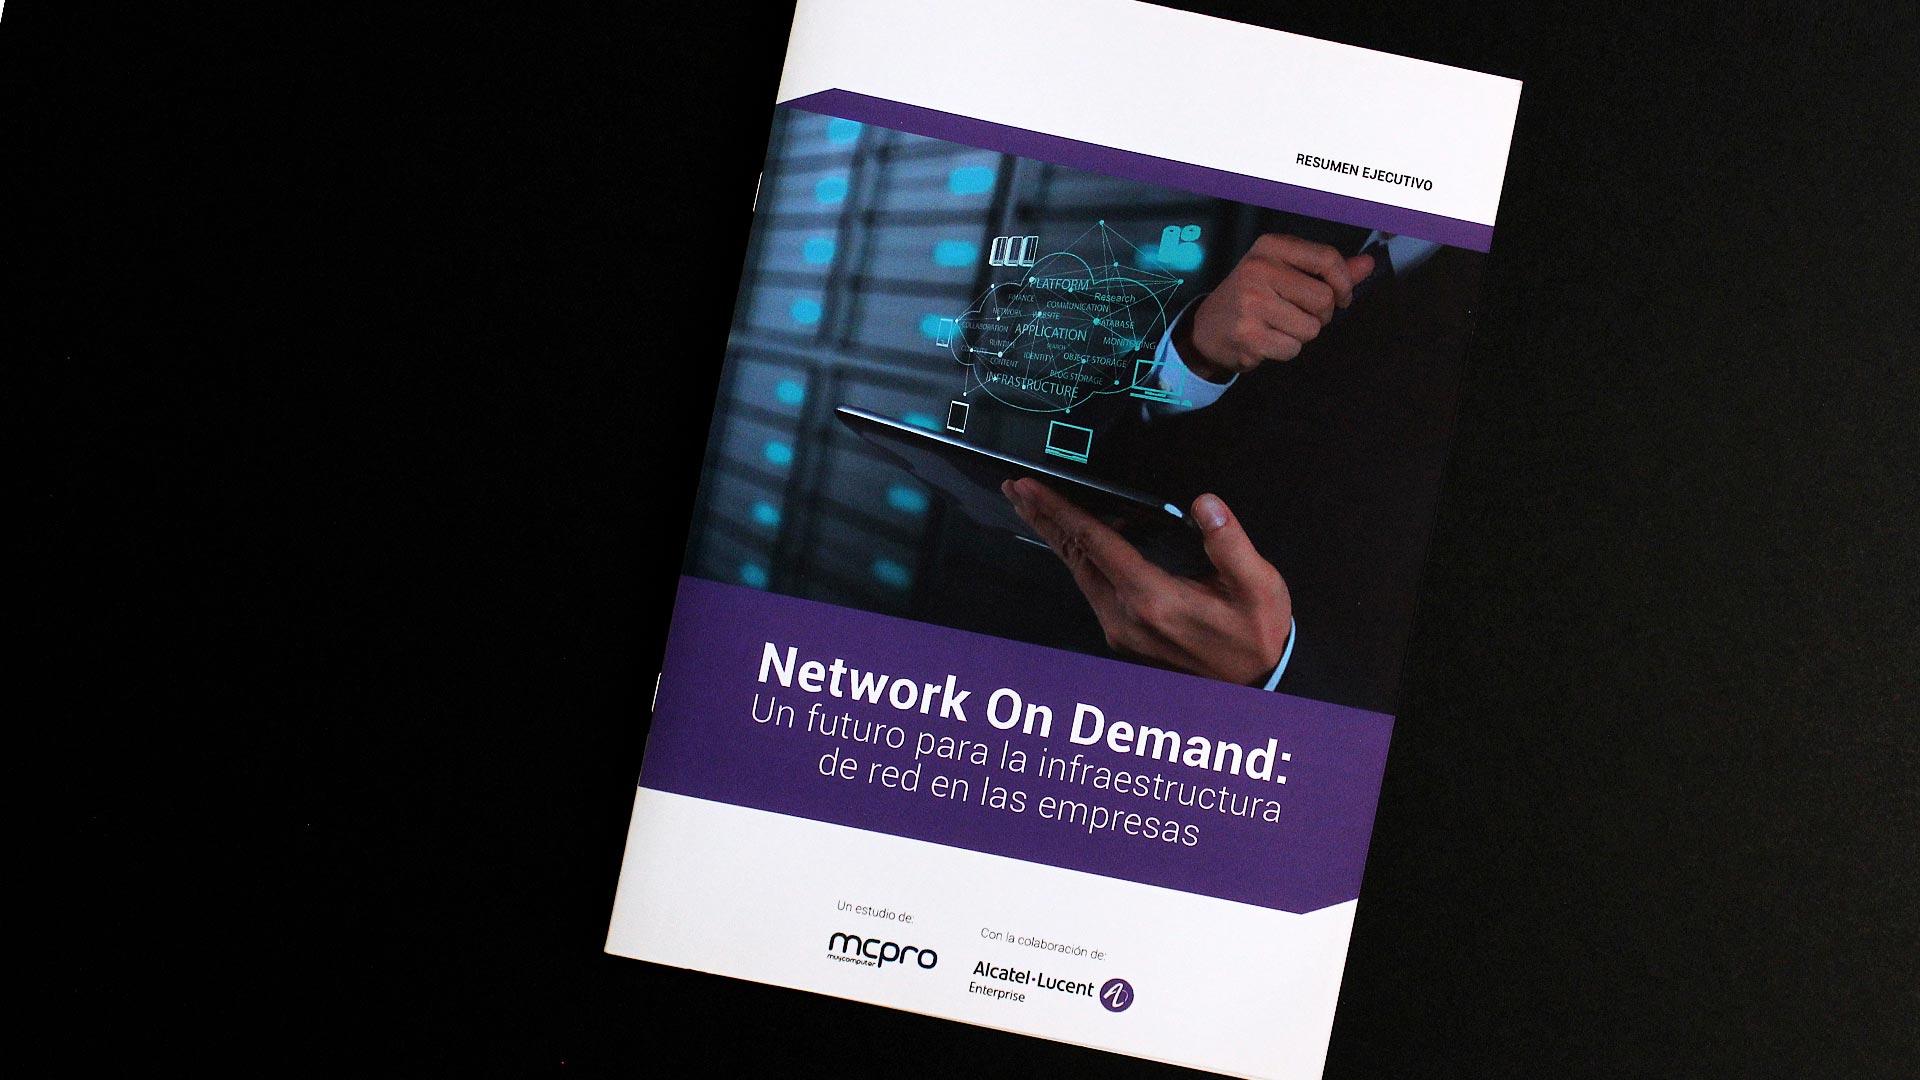 alcatel-content-marketing-informe-resumen-ejecutivo-networkondemand-ebook-2016-01